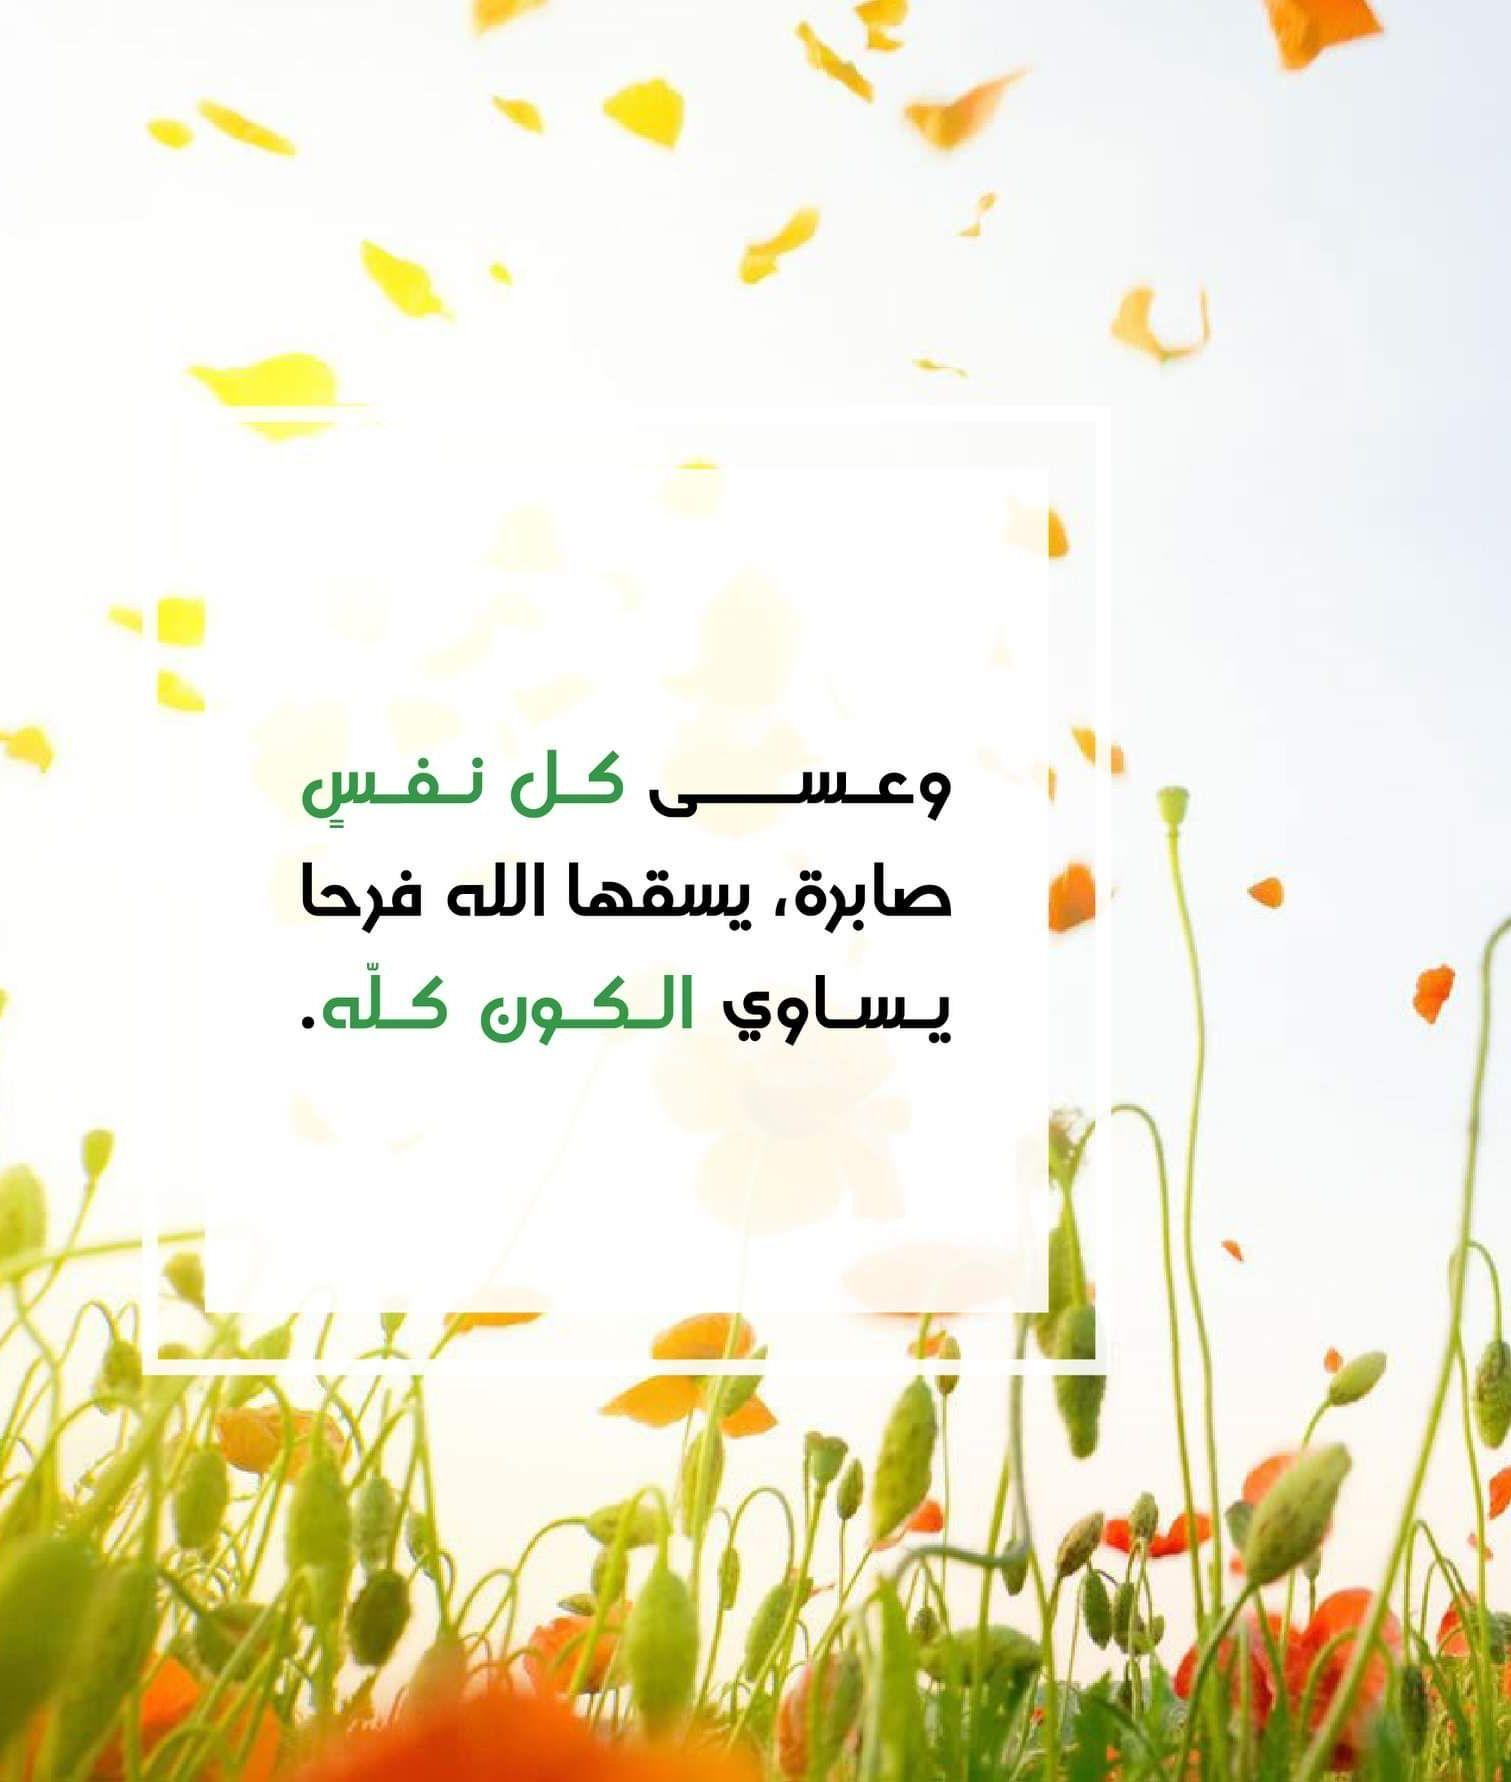 خواطر اسلامية بالصور Arabic Quotes Prayers Poster